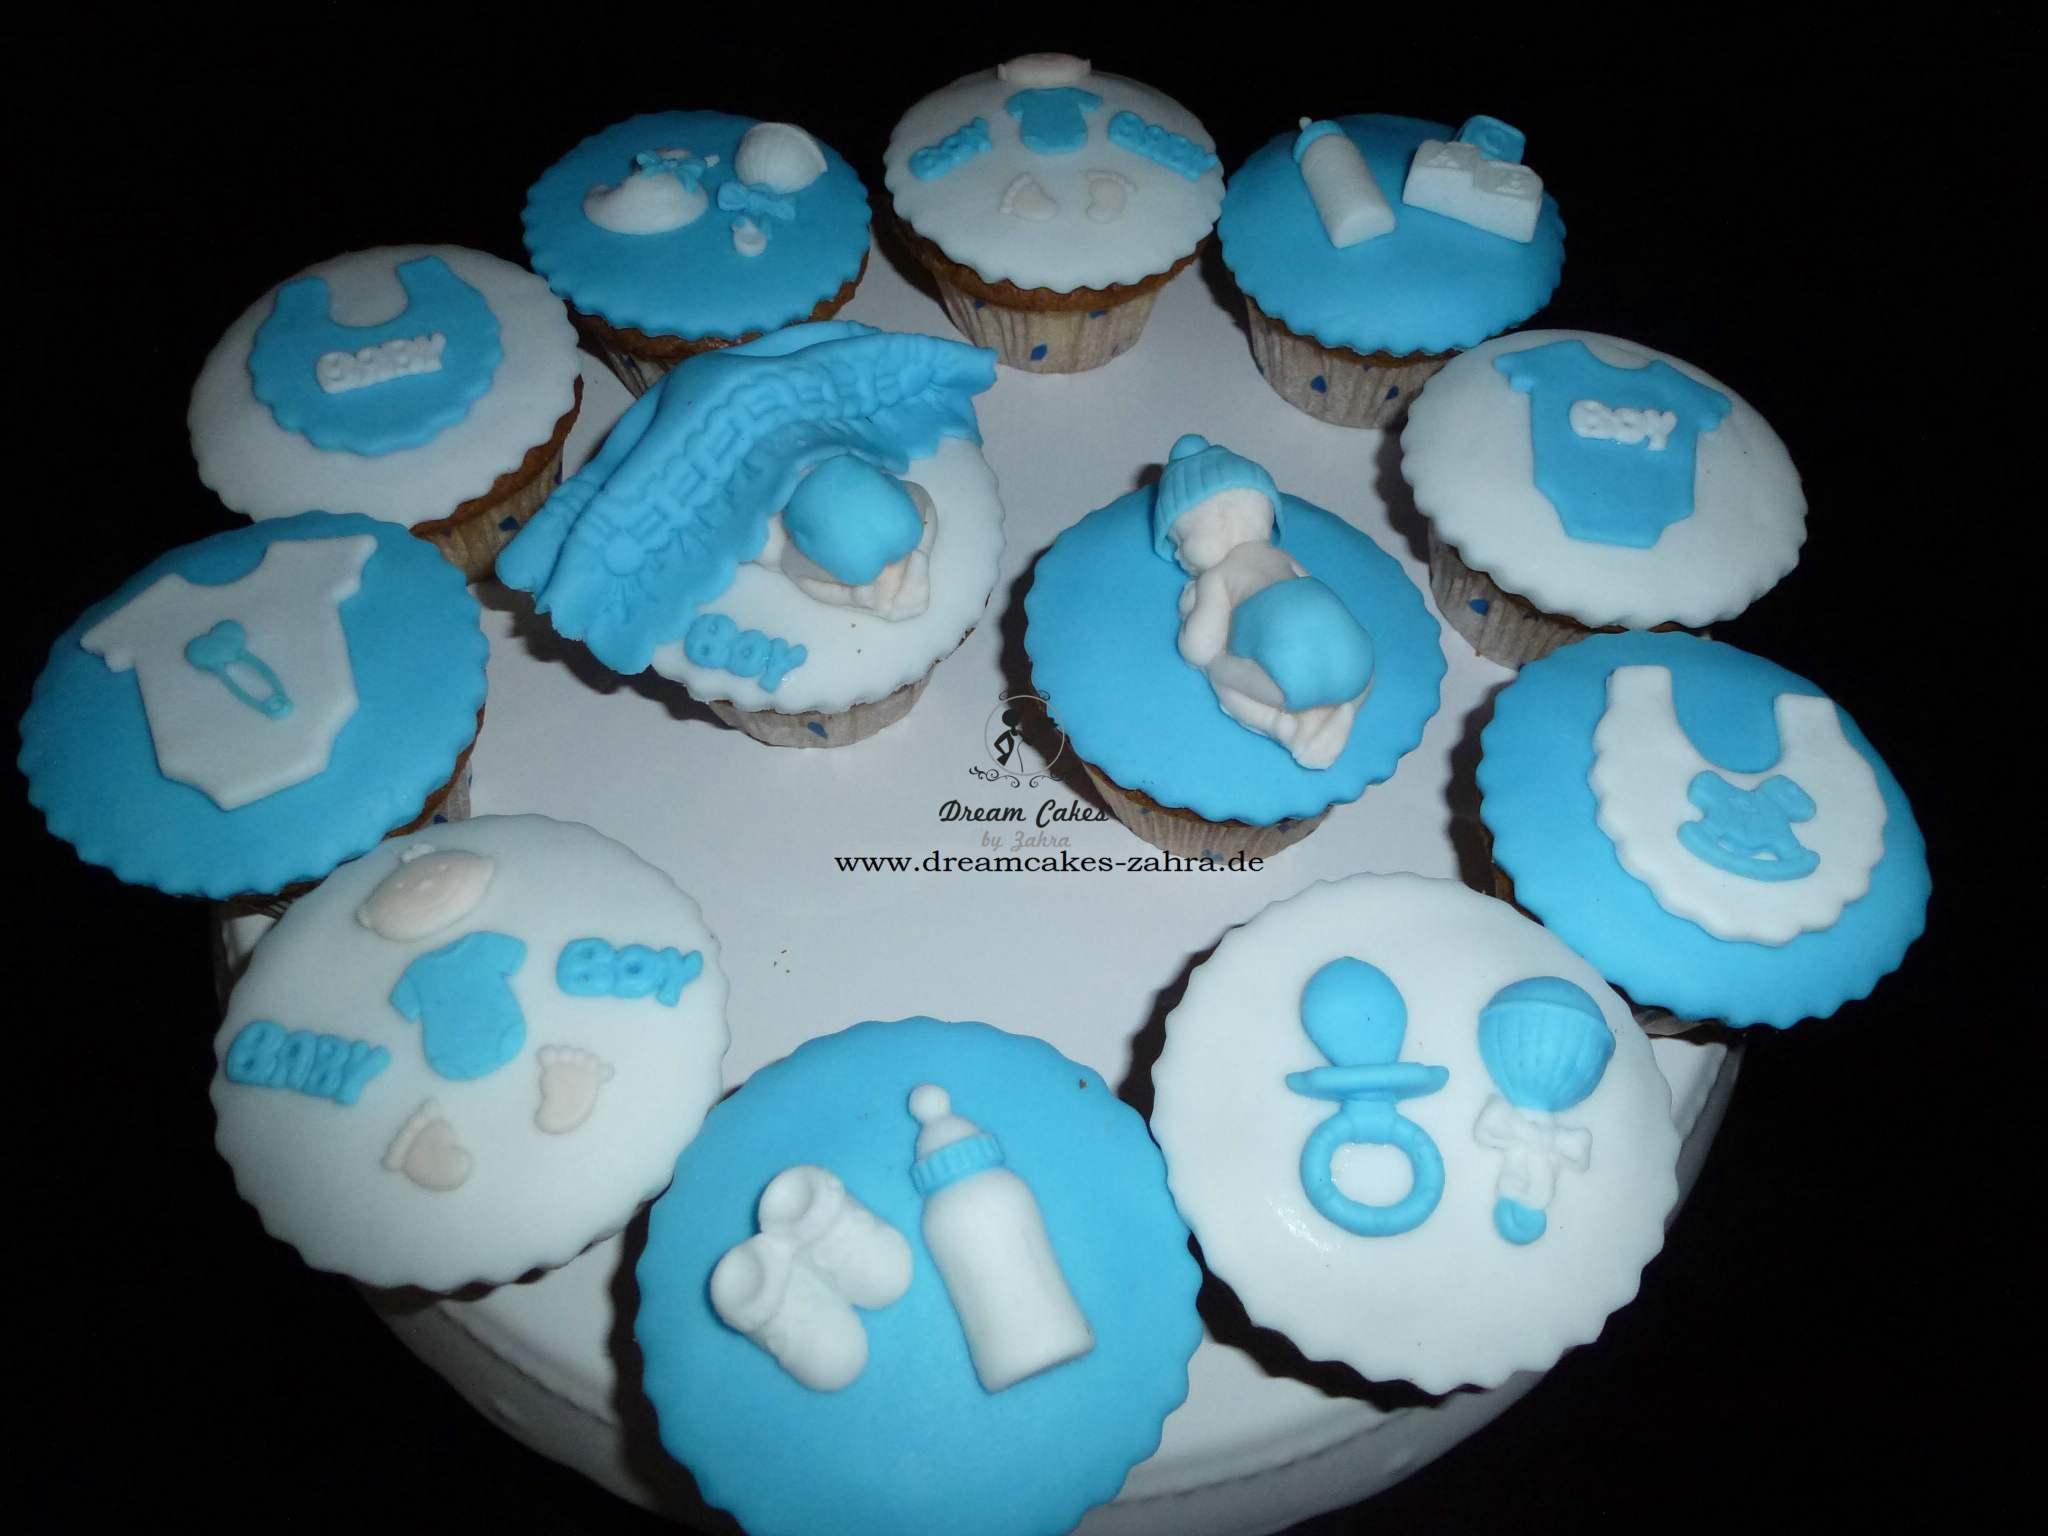 Zahras Cupcakes Dreams Cakes